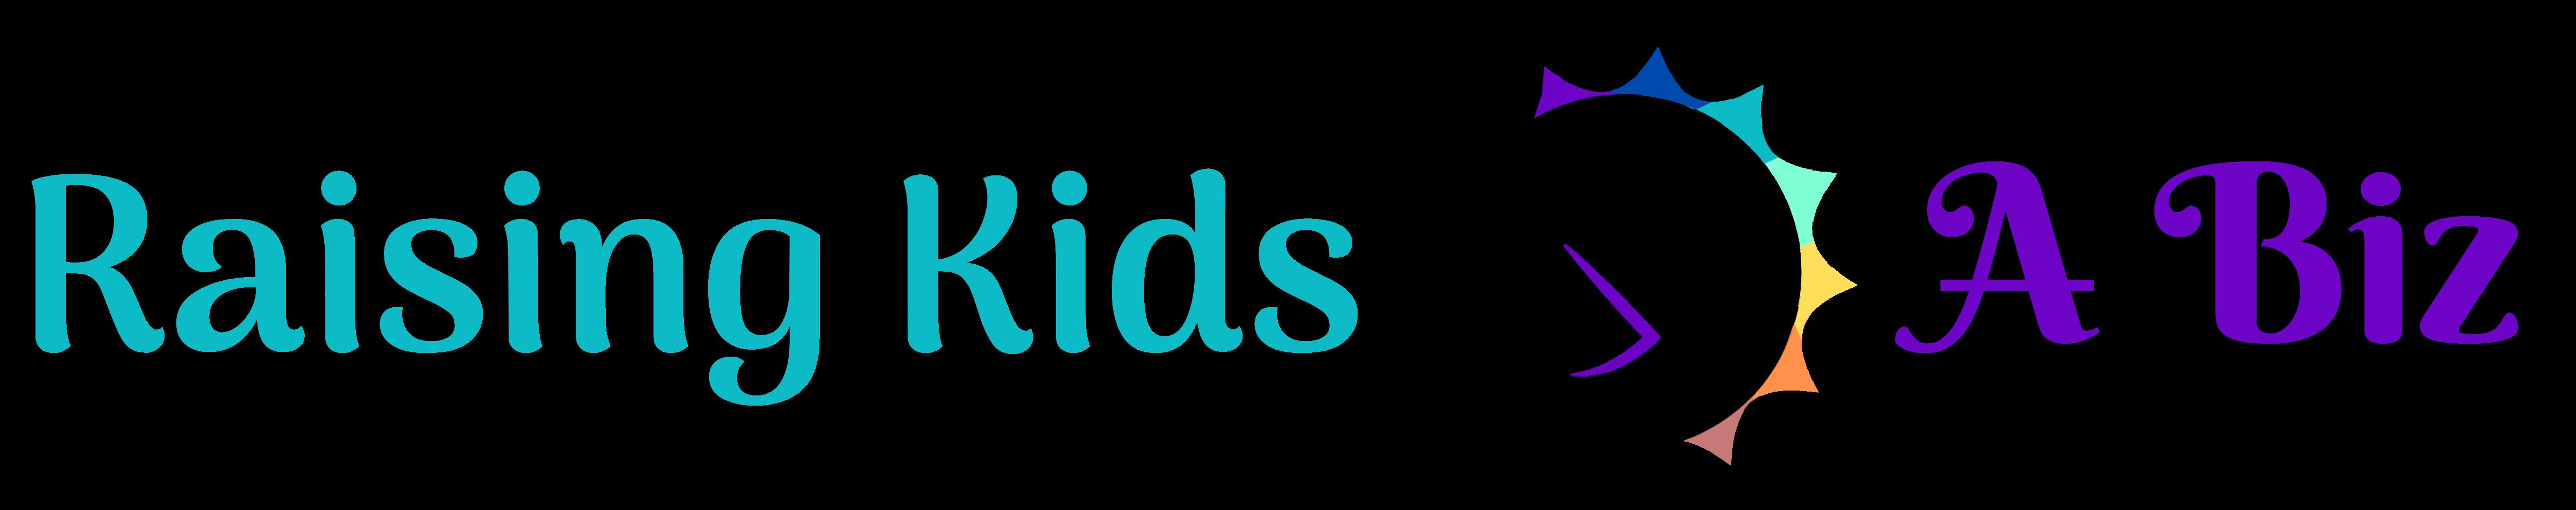 Raising Kids And A Biz with Caz Gaddis